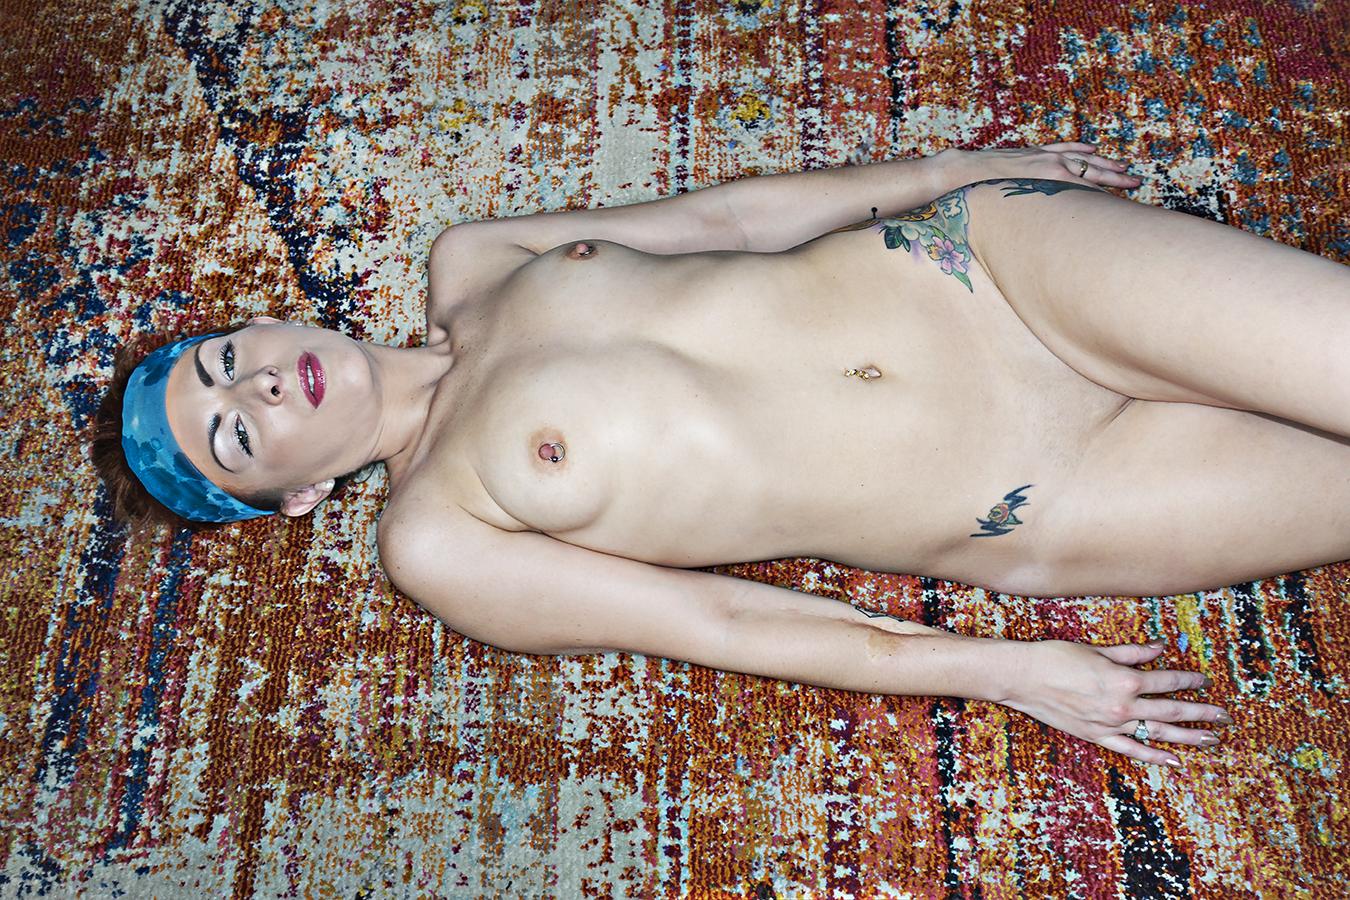 Tony_Ward_Studio_Katie_Kerl_nude_tattoos_piercings_erotic